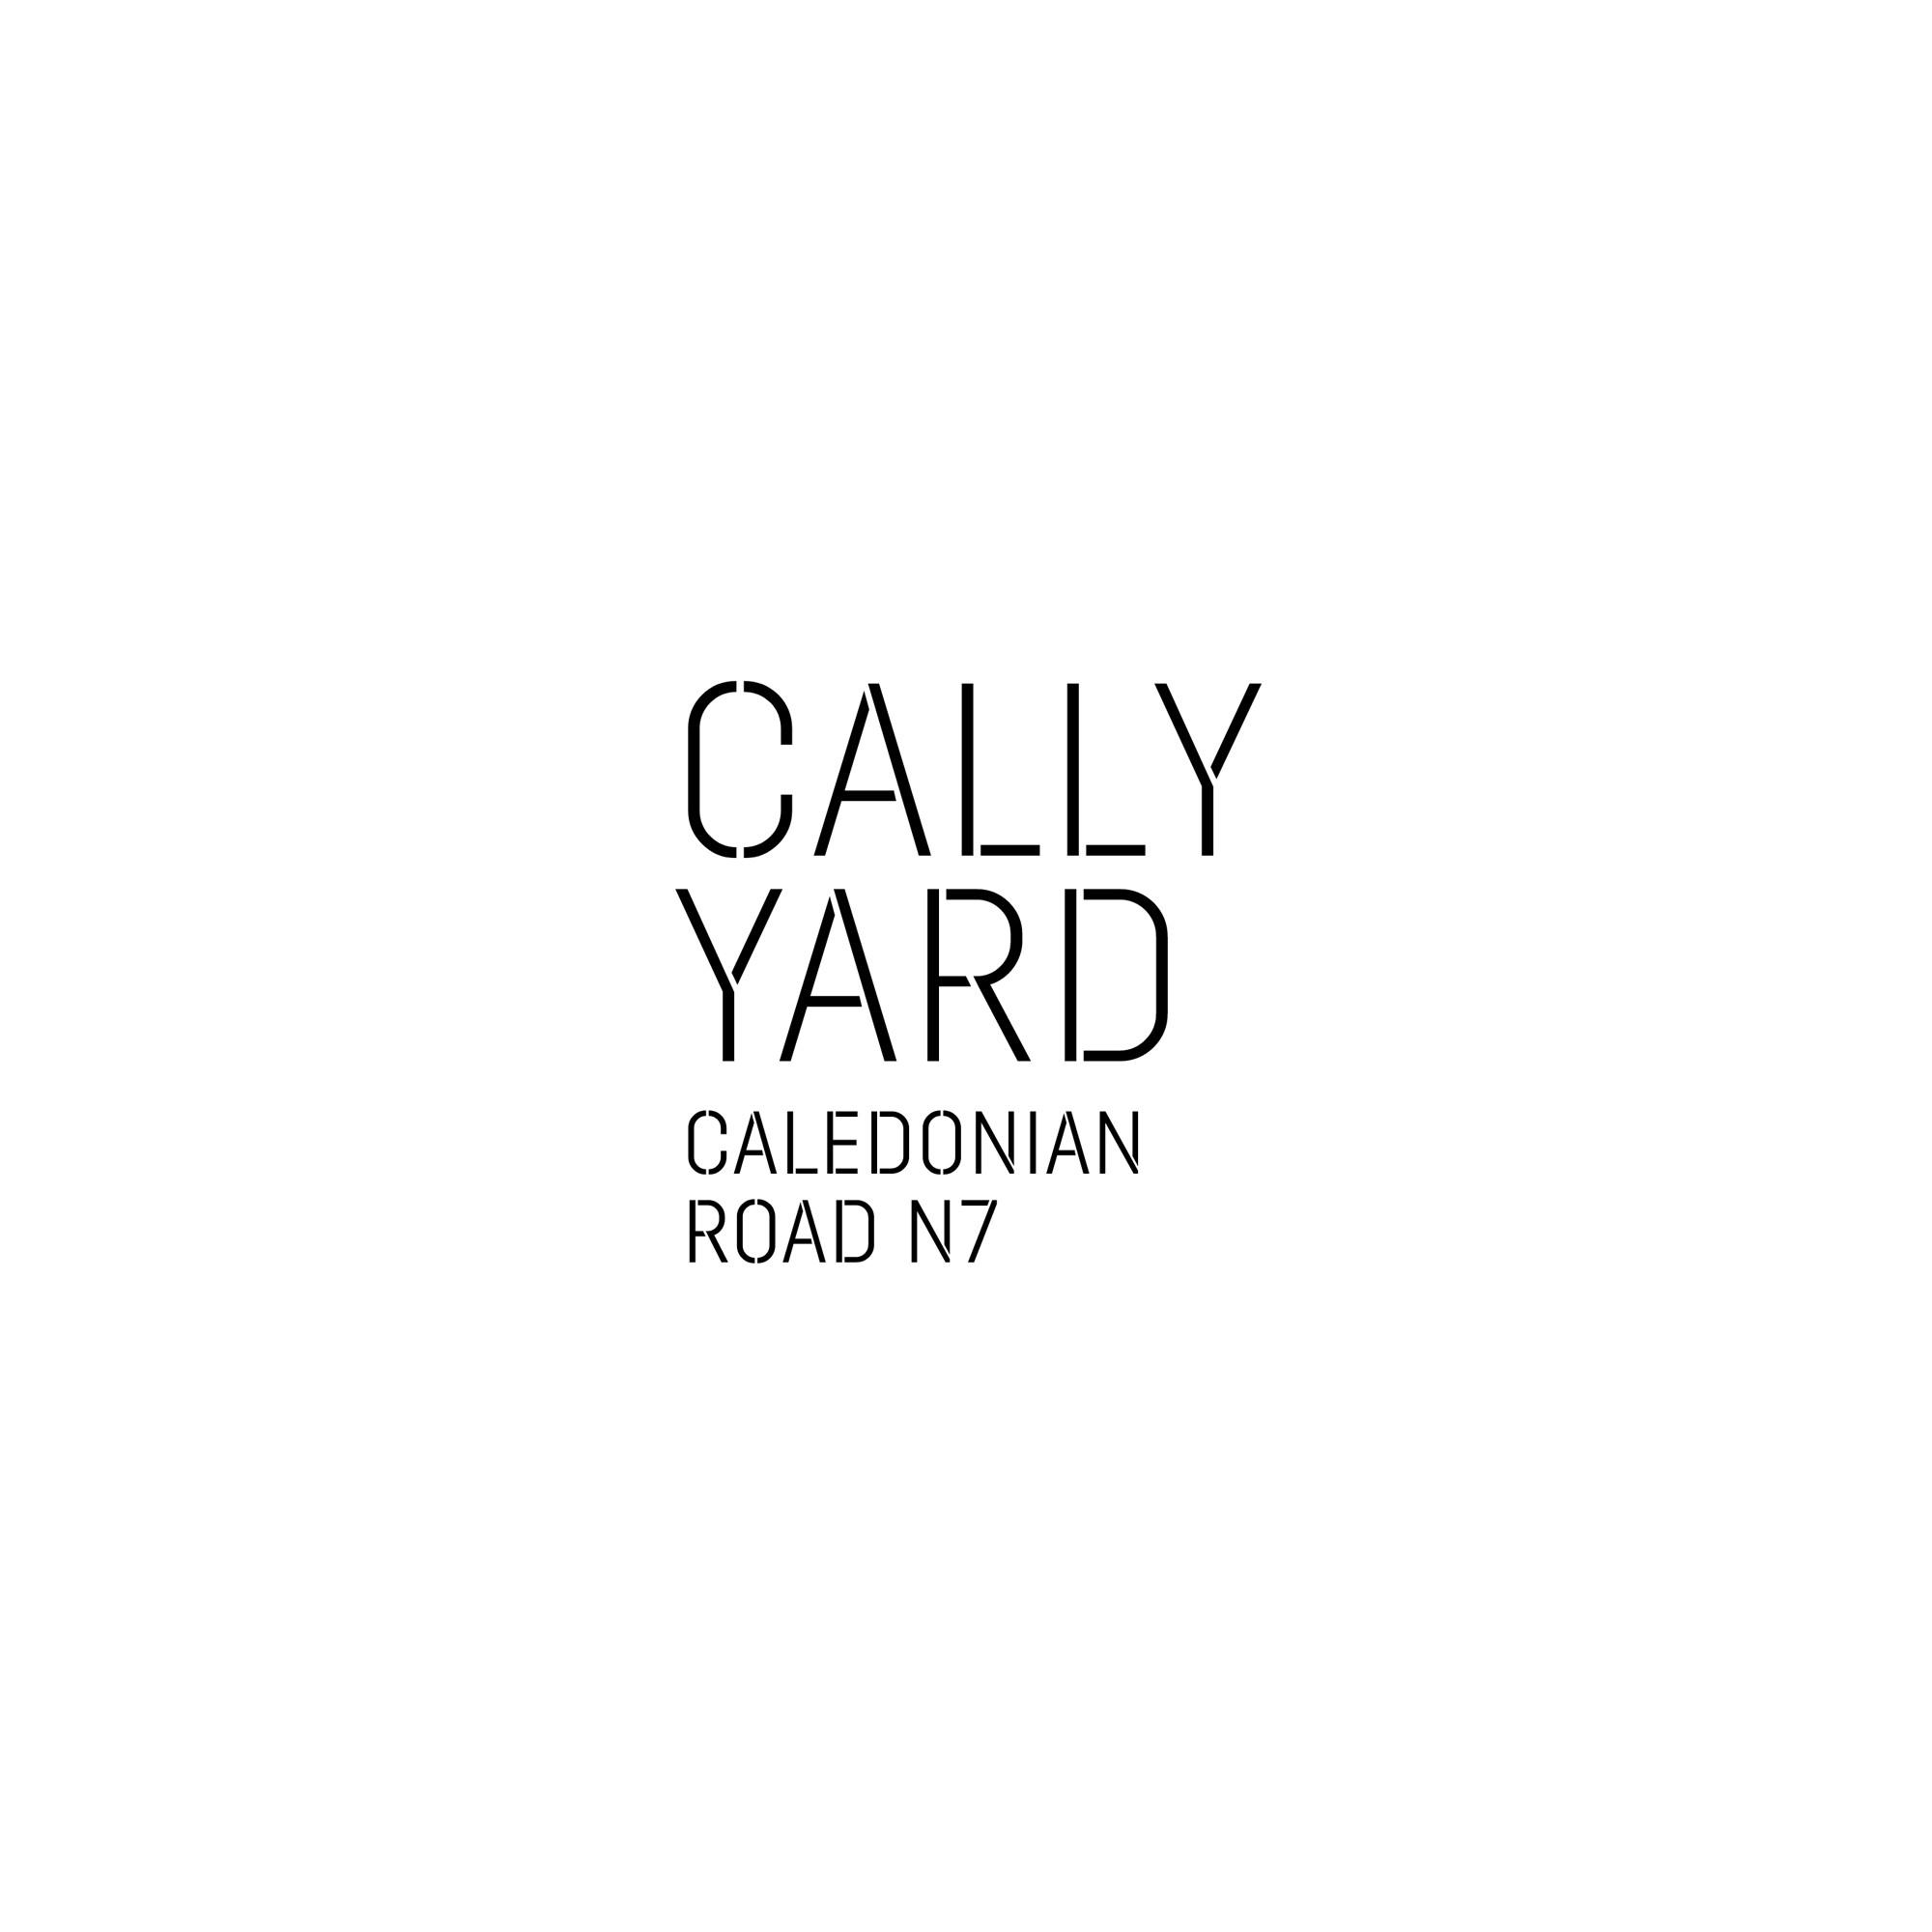 Cally Yard commercial development logo